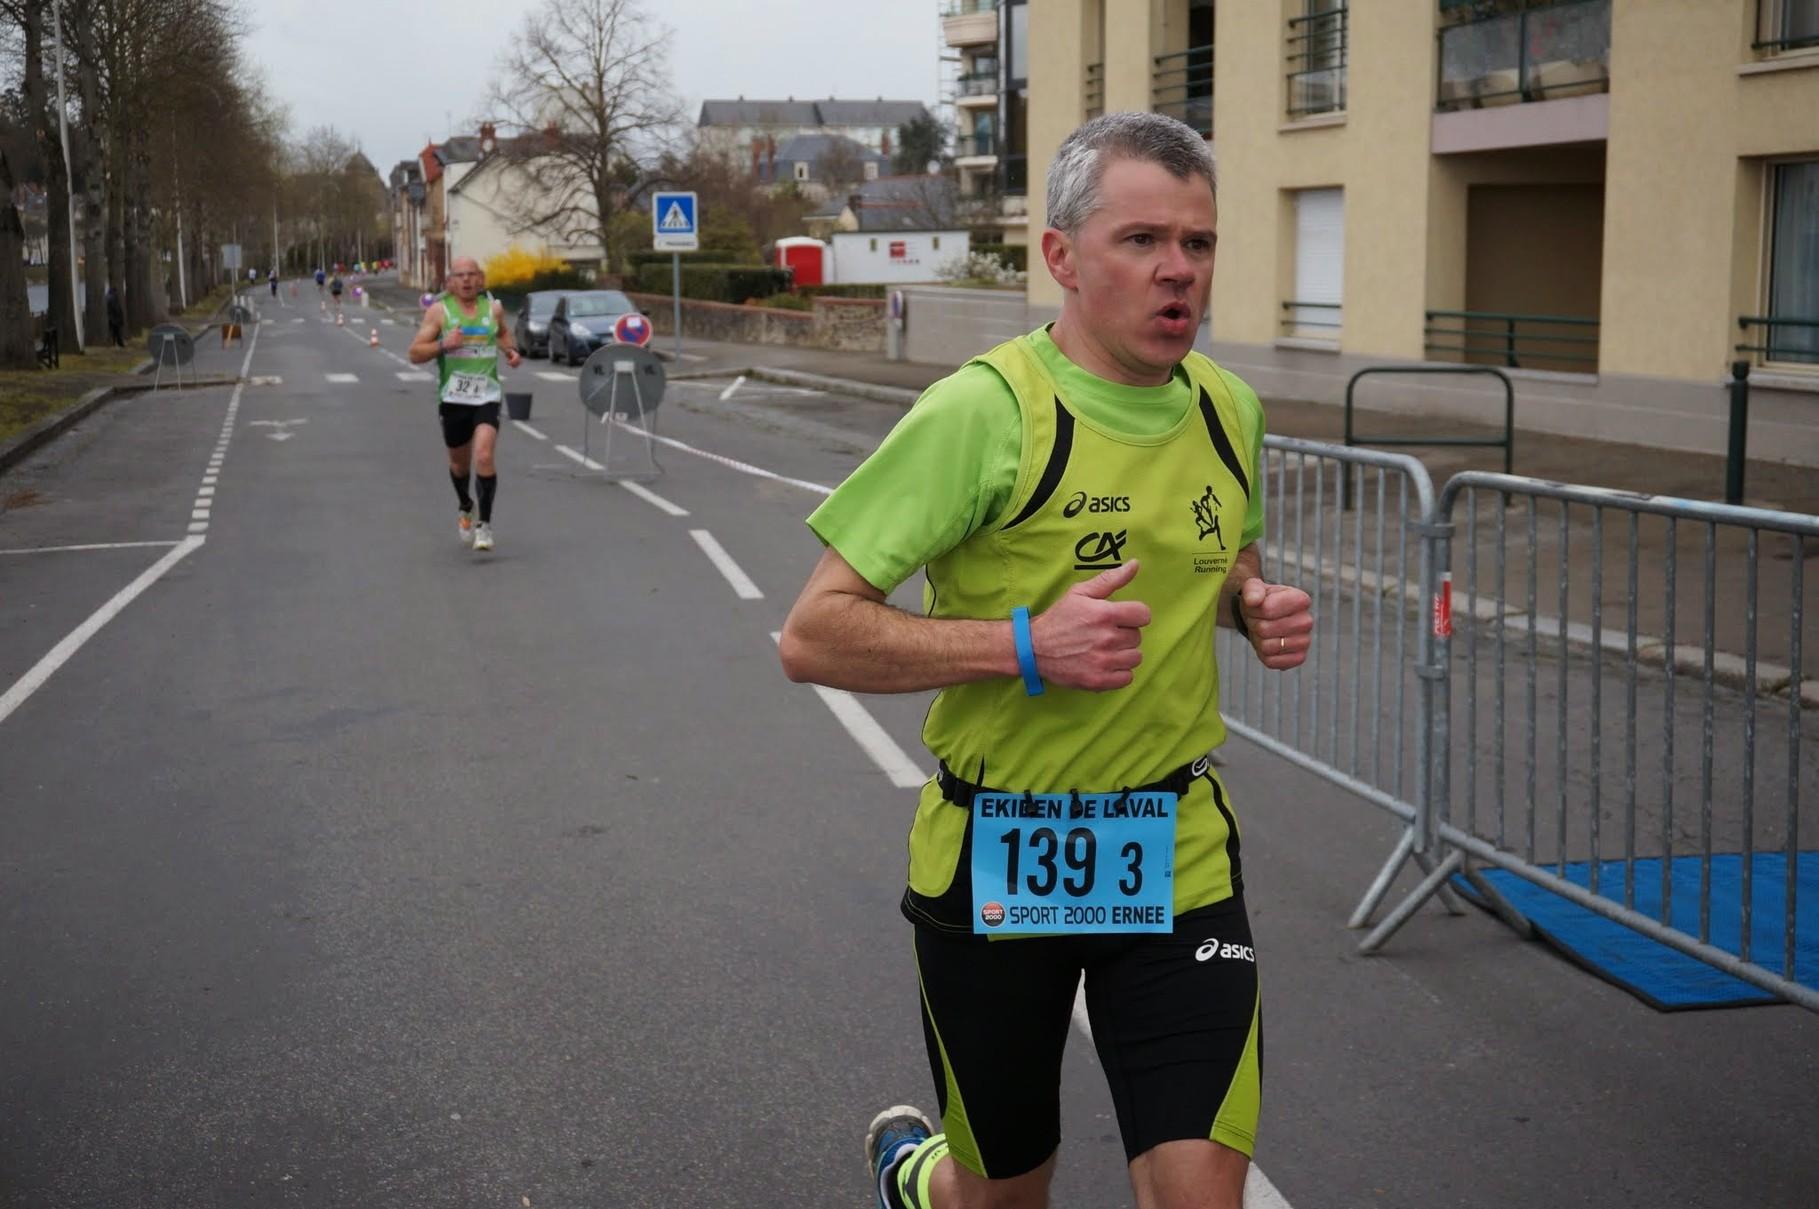 Philippe de Louverné Running